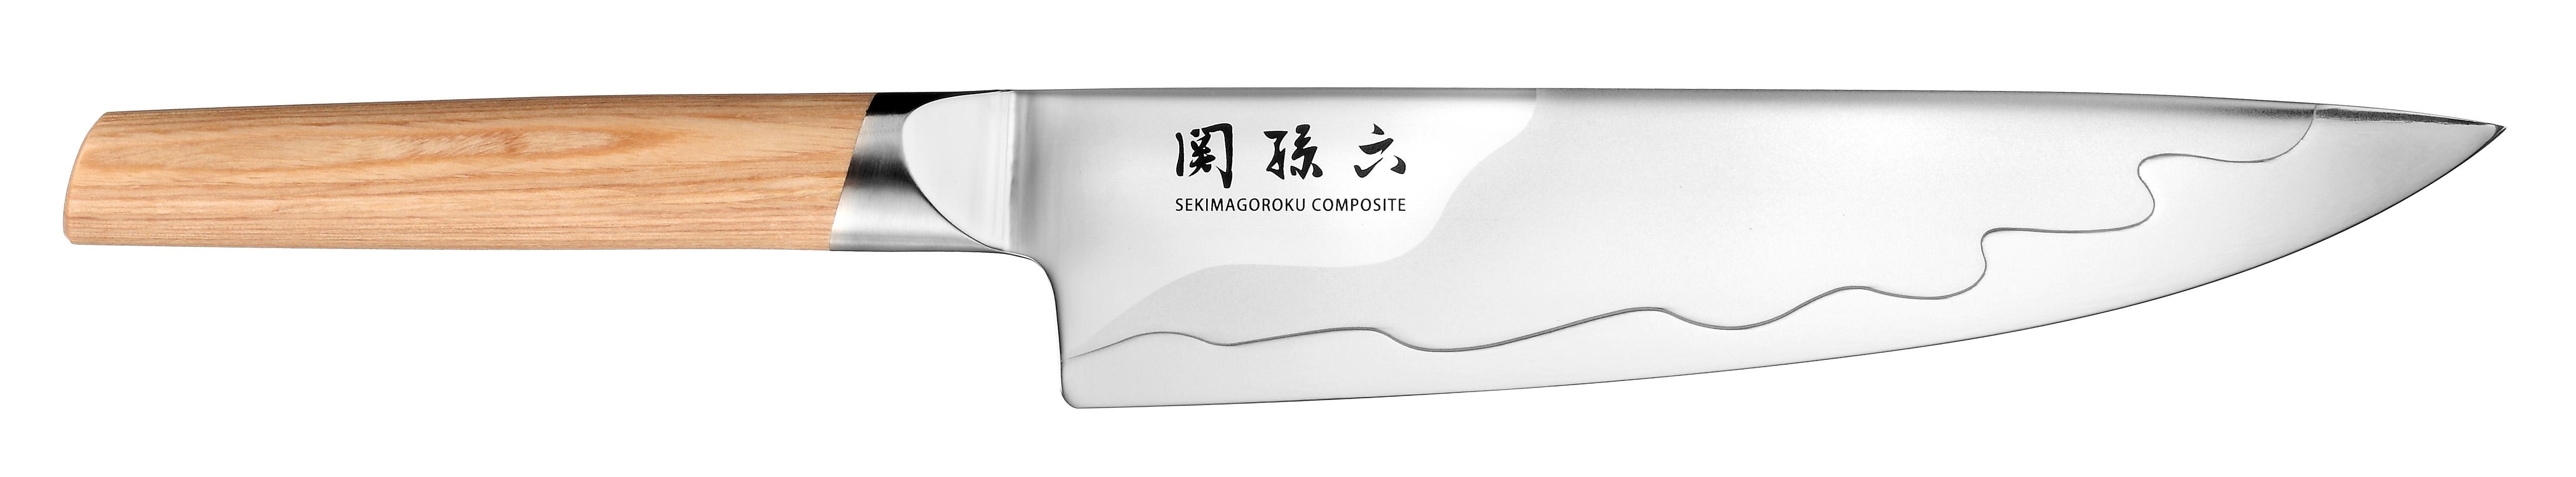 KAI SEKI MAGOROKU COMPOSITE MGC-0406